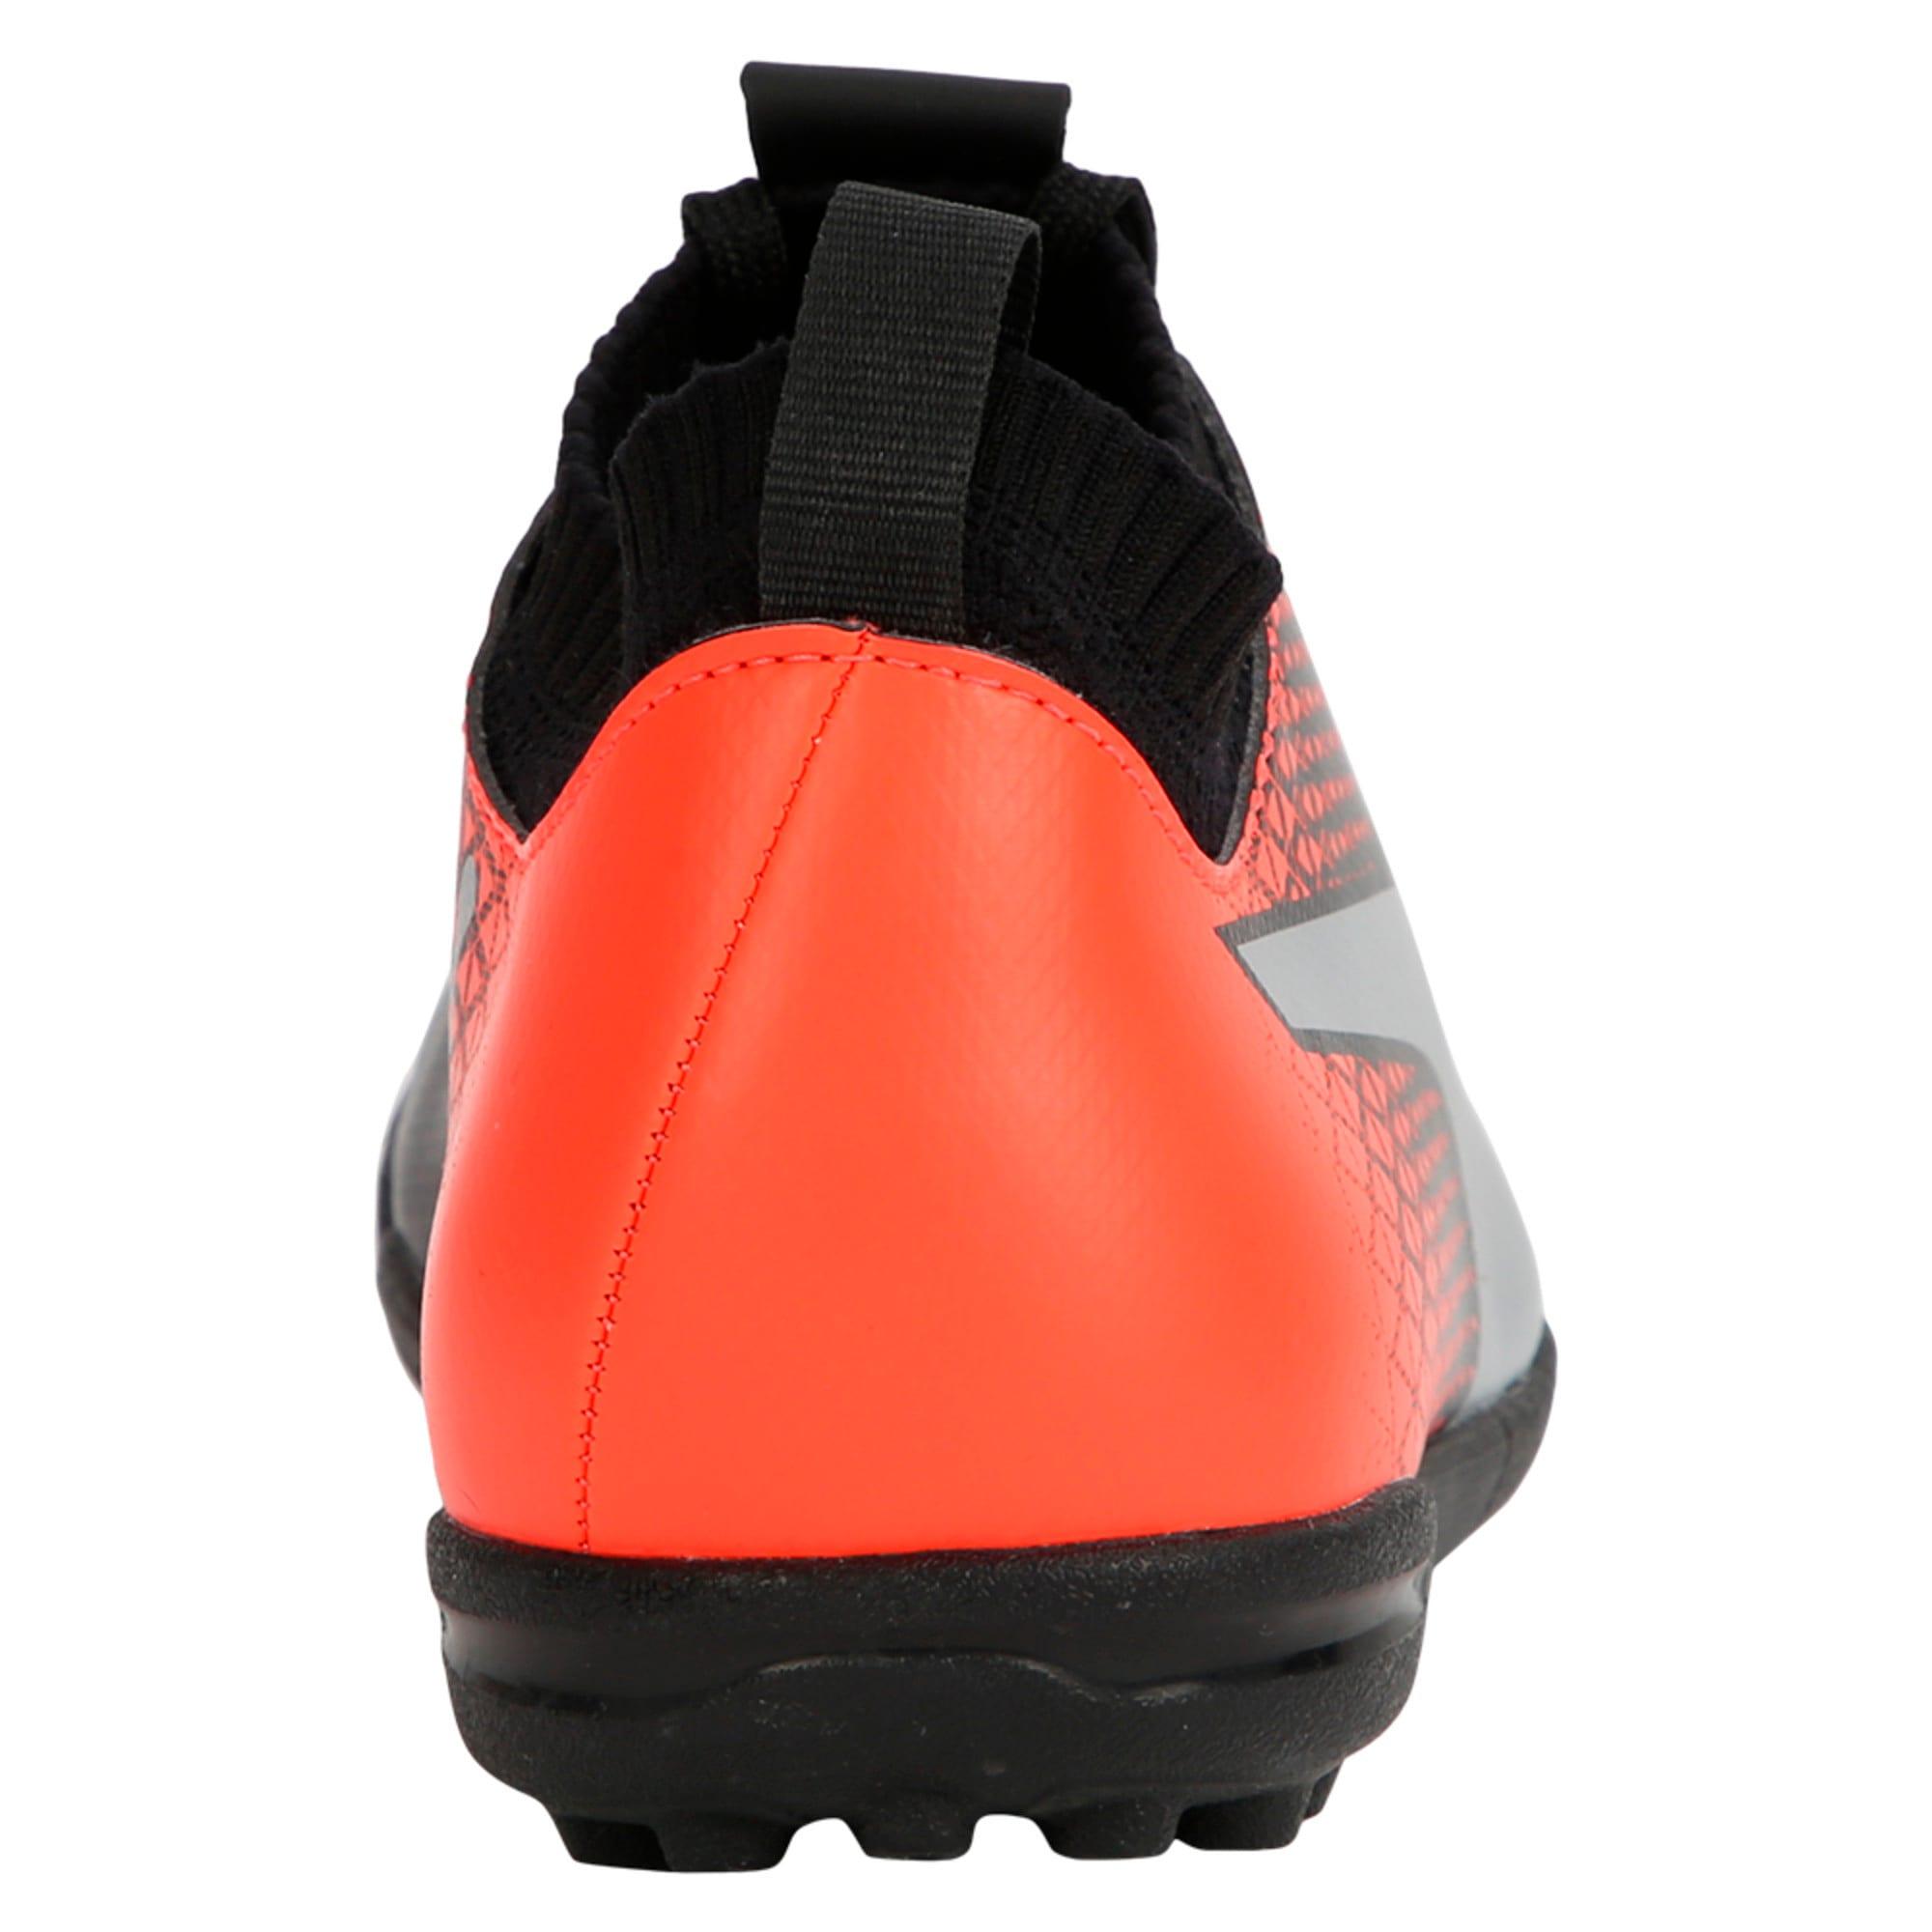 Thumbnail 3 of evoKNIT TT Men's Football Shoes, Black-Silver-Red, medium-IND